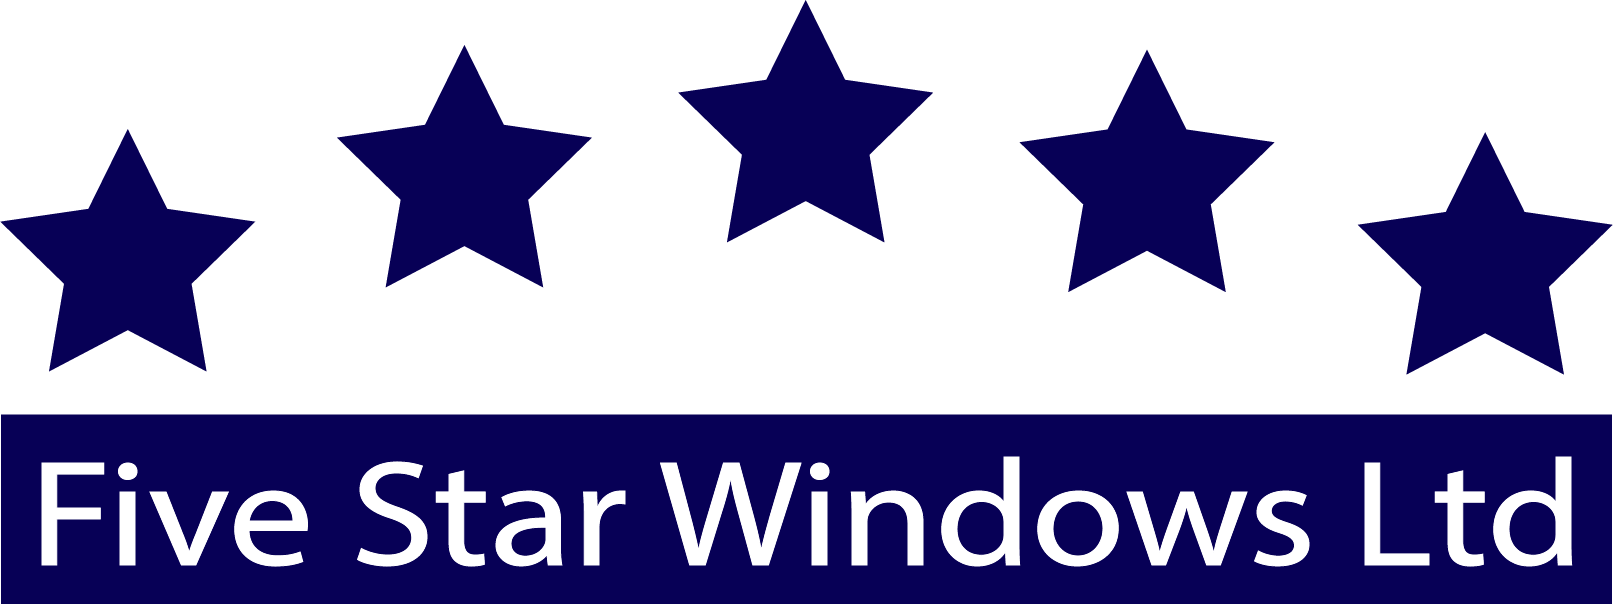 Five_Star_Windows_Logo_White_Background